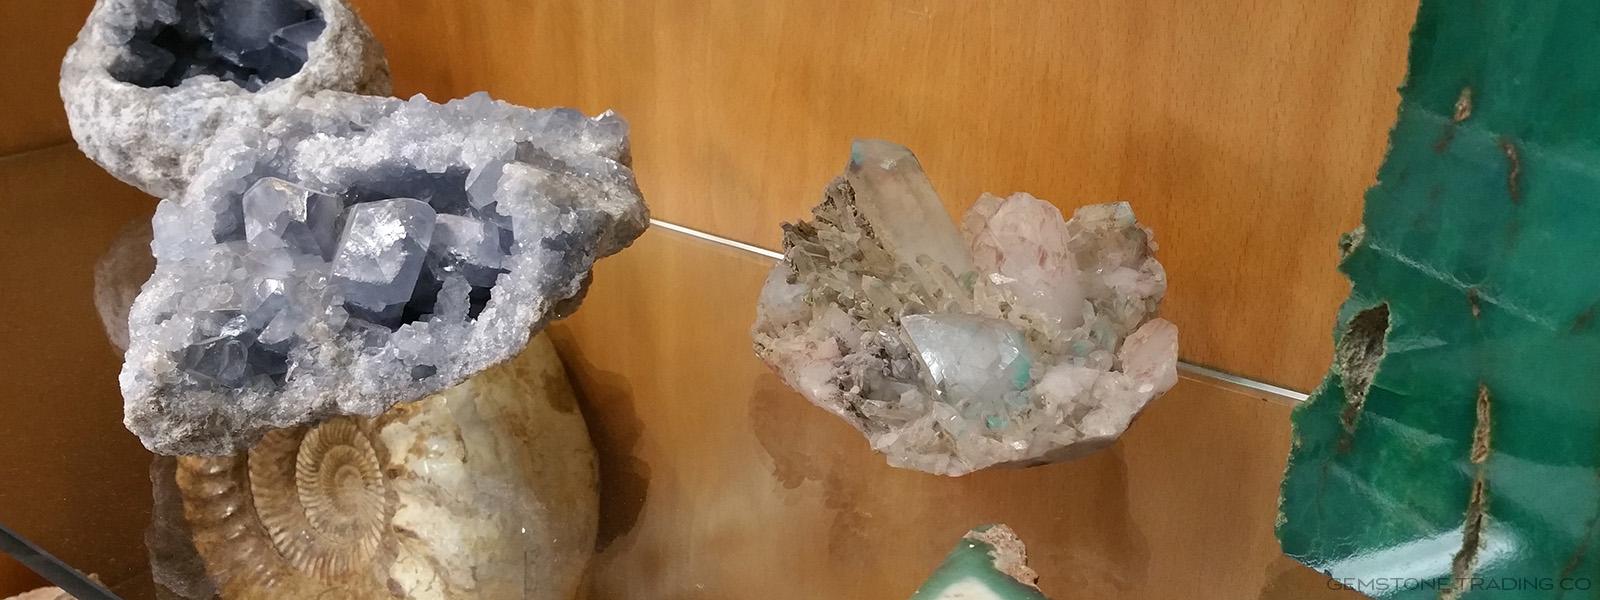 Gemstone Trading Co Specimens